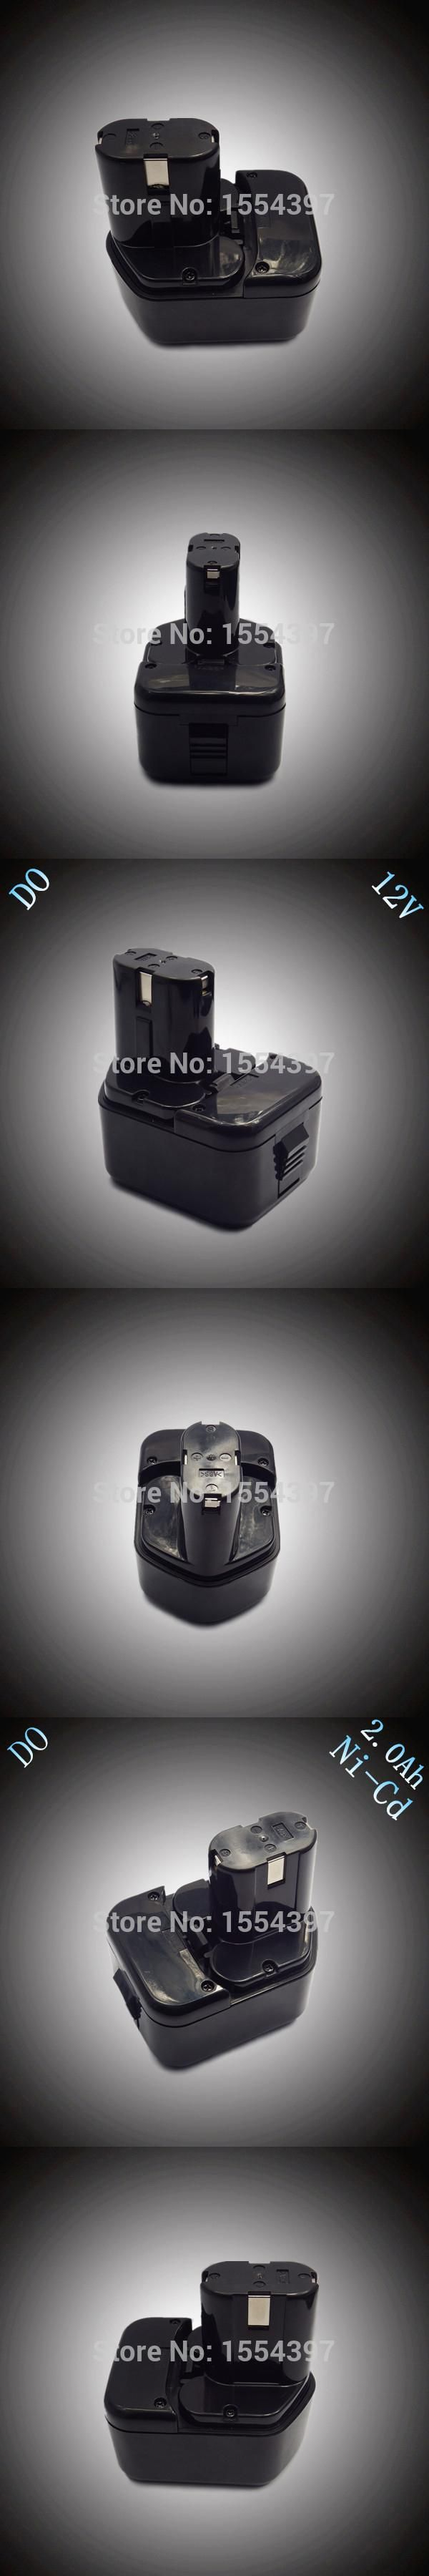 Sale 12V NI-CD 2000mAh Replacement for HITACHI Rechargeable Power Tool Battery EB1212S EB1220HL EB1220 EB1214S EB1230X EB1233X